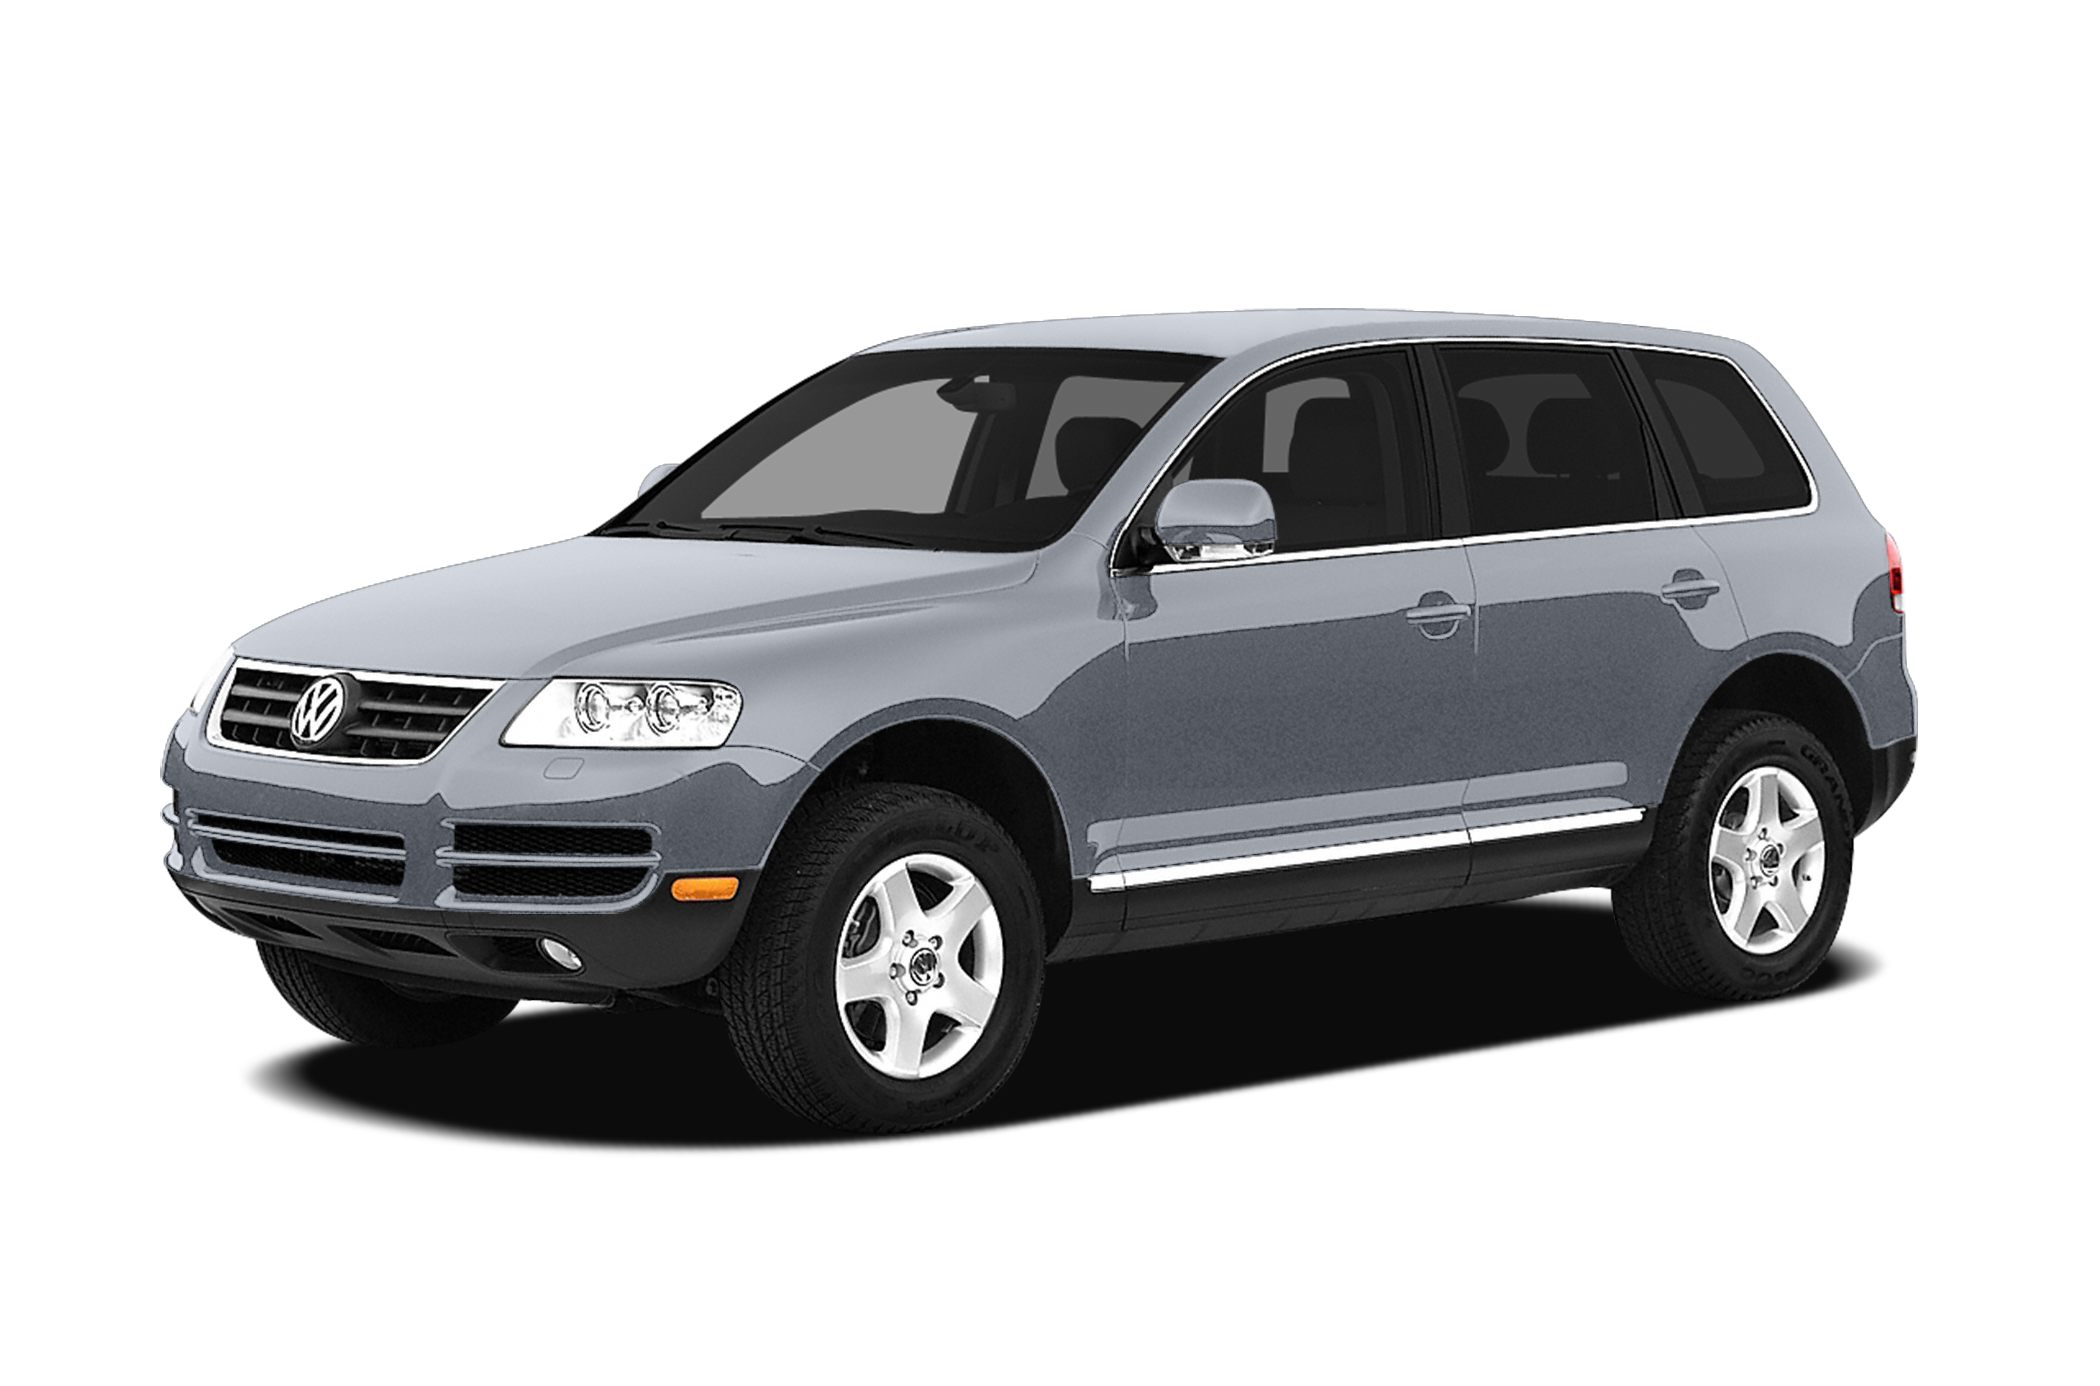 2005 Volkswagen Touareg Specs And Prices